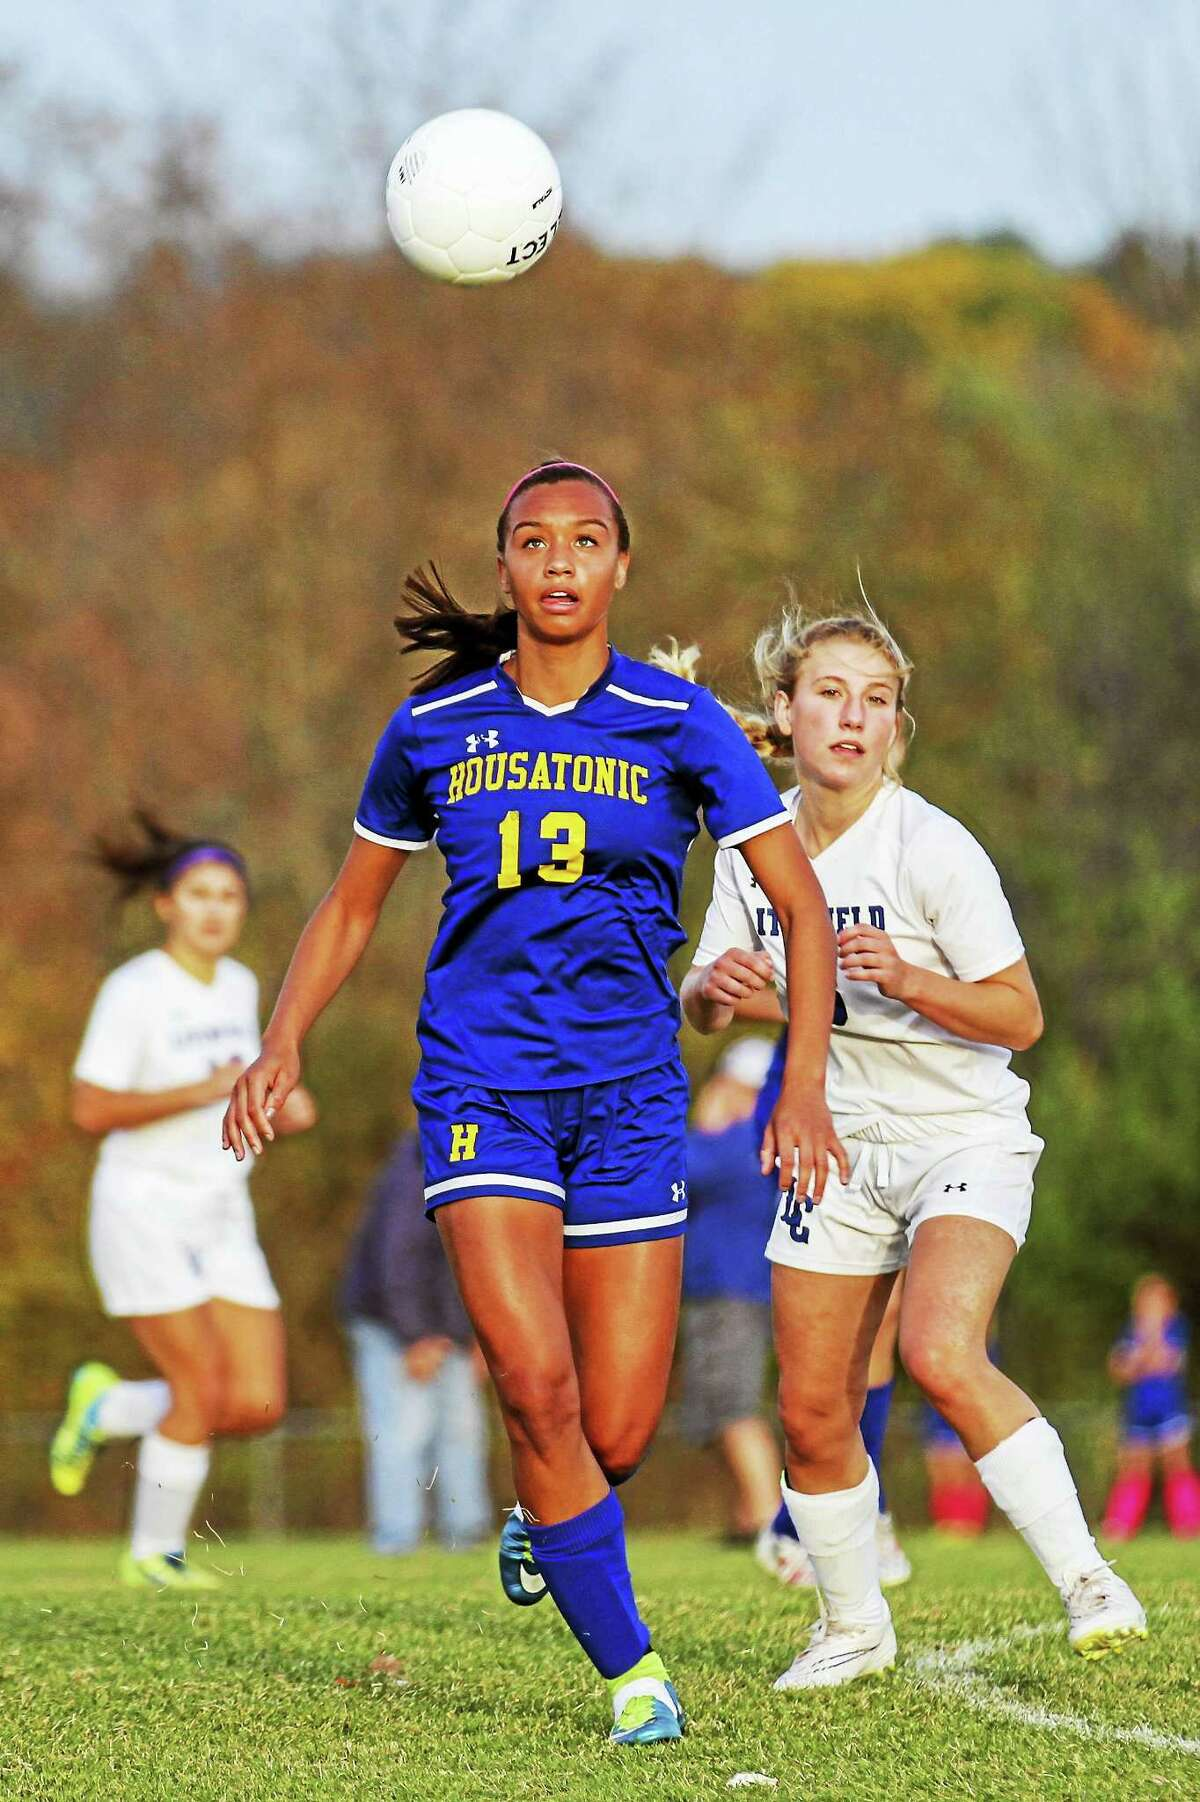 Housatonic's Lauren Segalla heads a long list of girls soccer stars in Litchfield County.